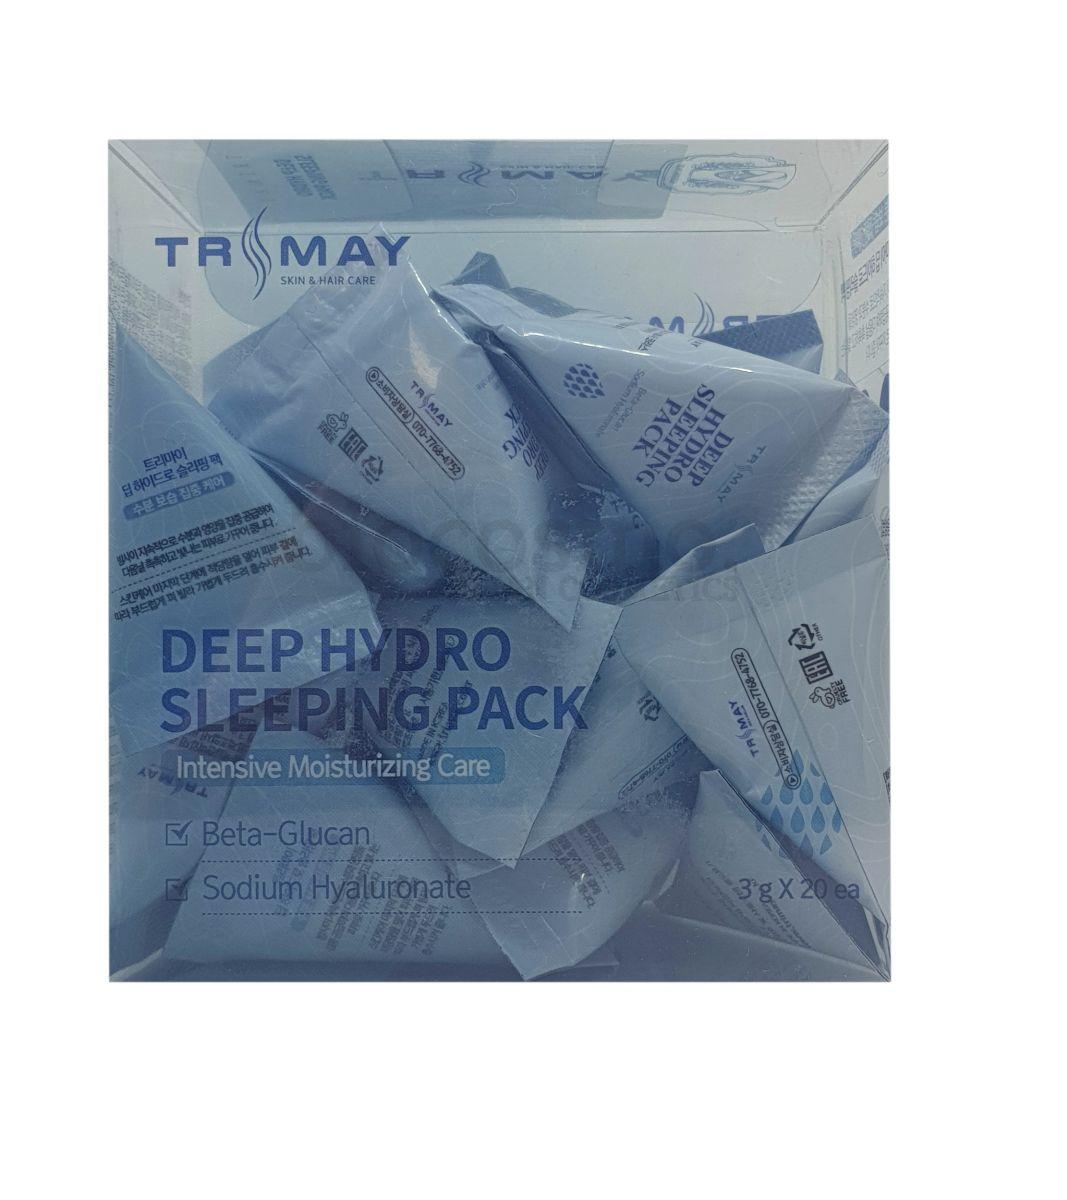 Увлажняющая ночная маска с бета-глюканом Trimay Deep Hydro Sleeping Pack - 3 гр